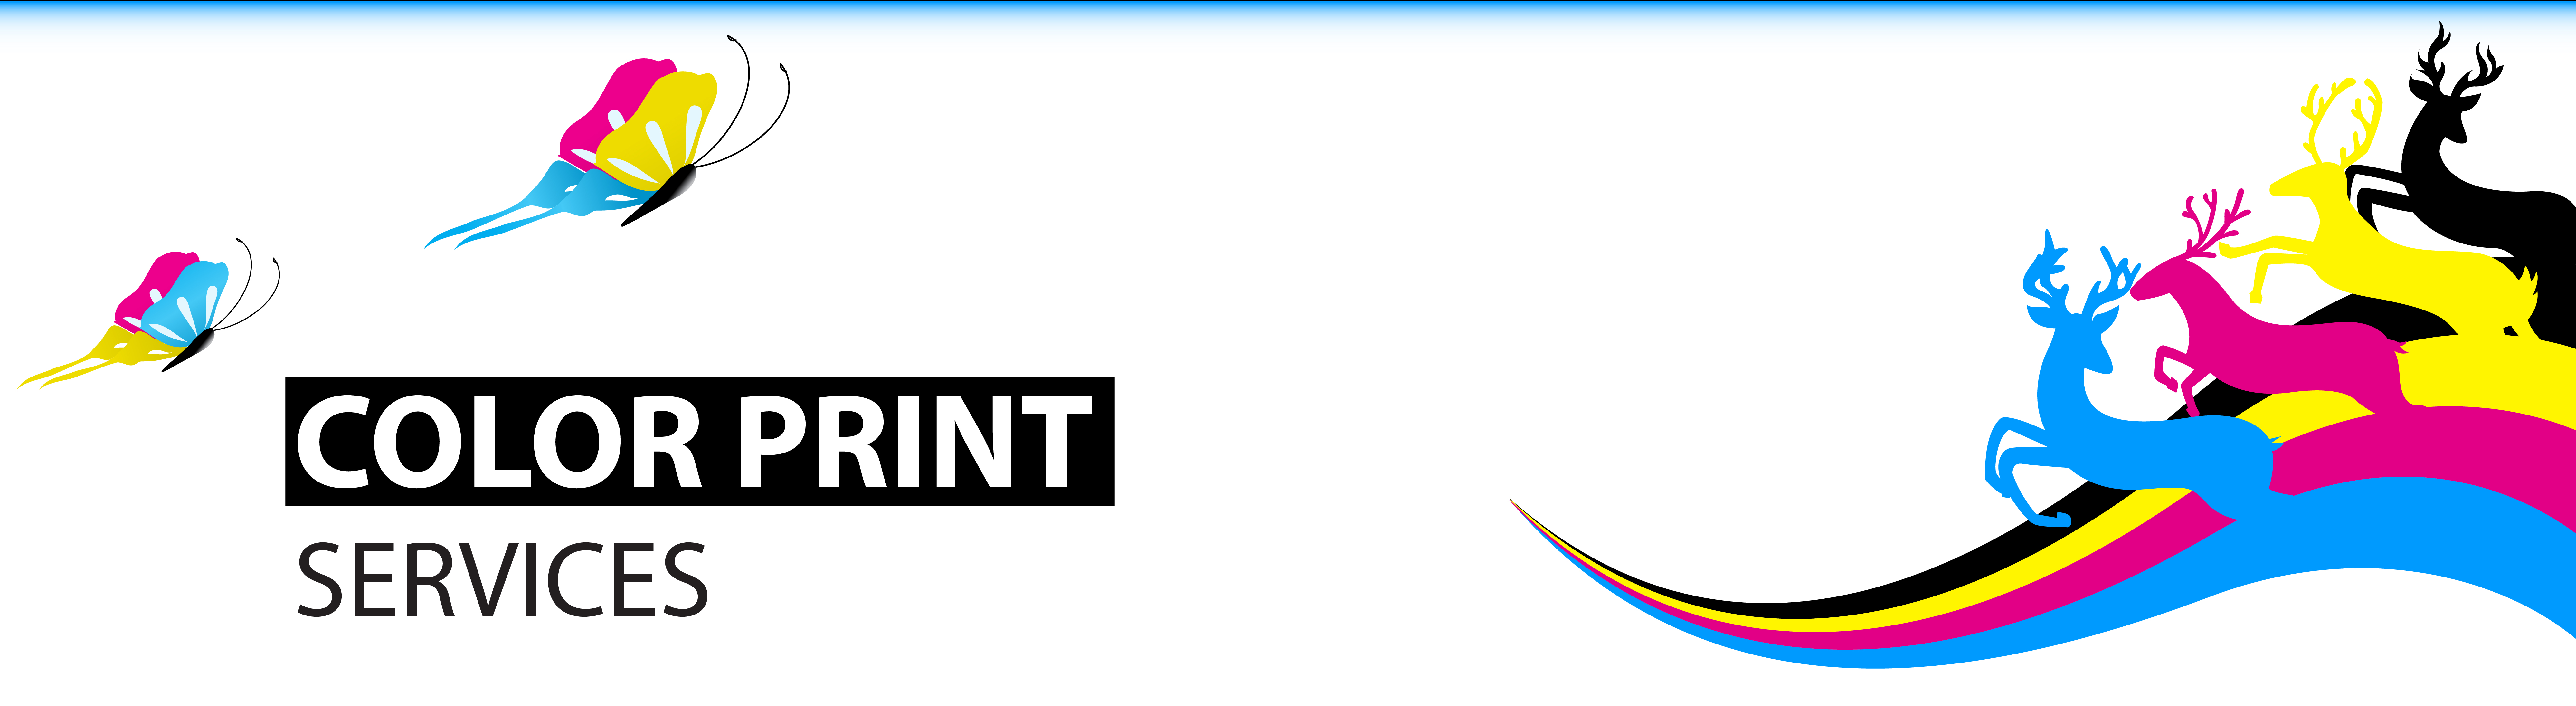 Print Services: color_printing | Spunk & Glam